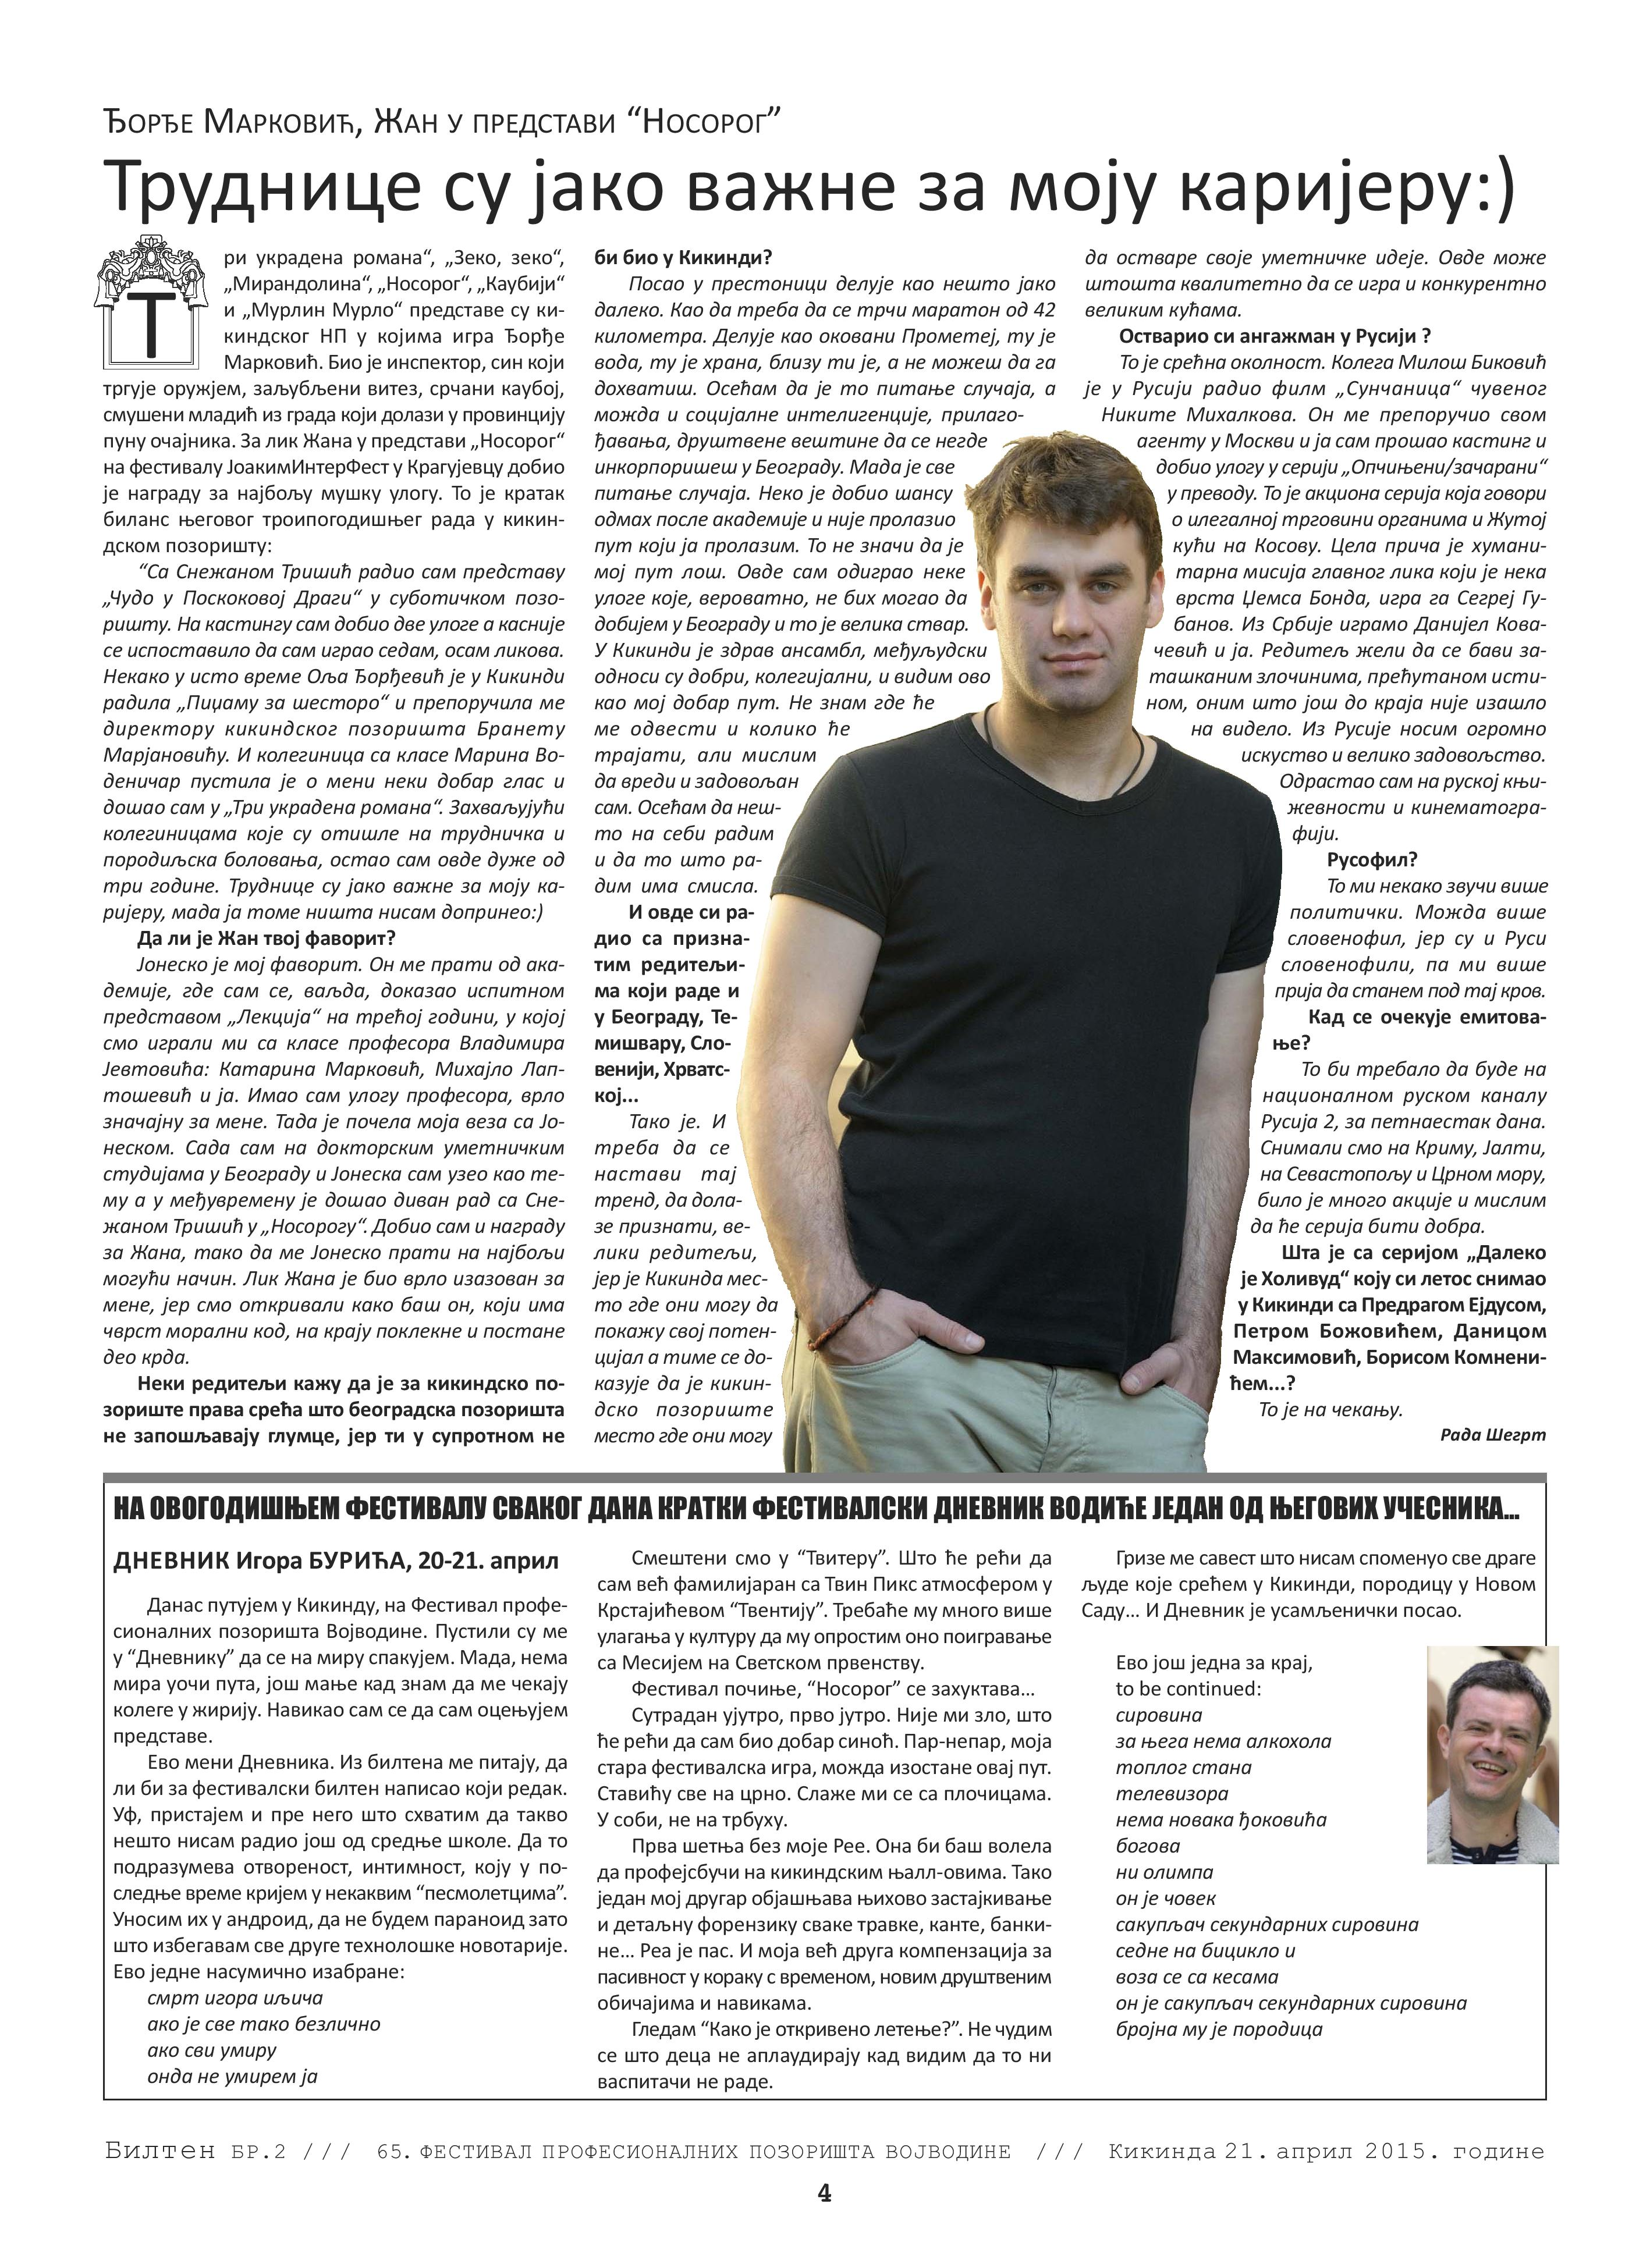 BILTEN_02_21 april-page-004